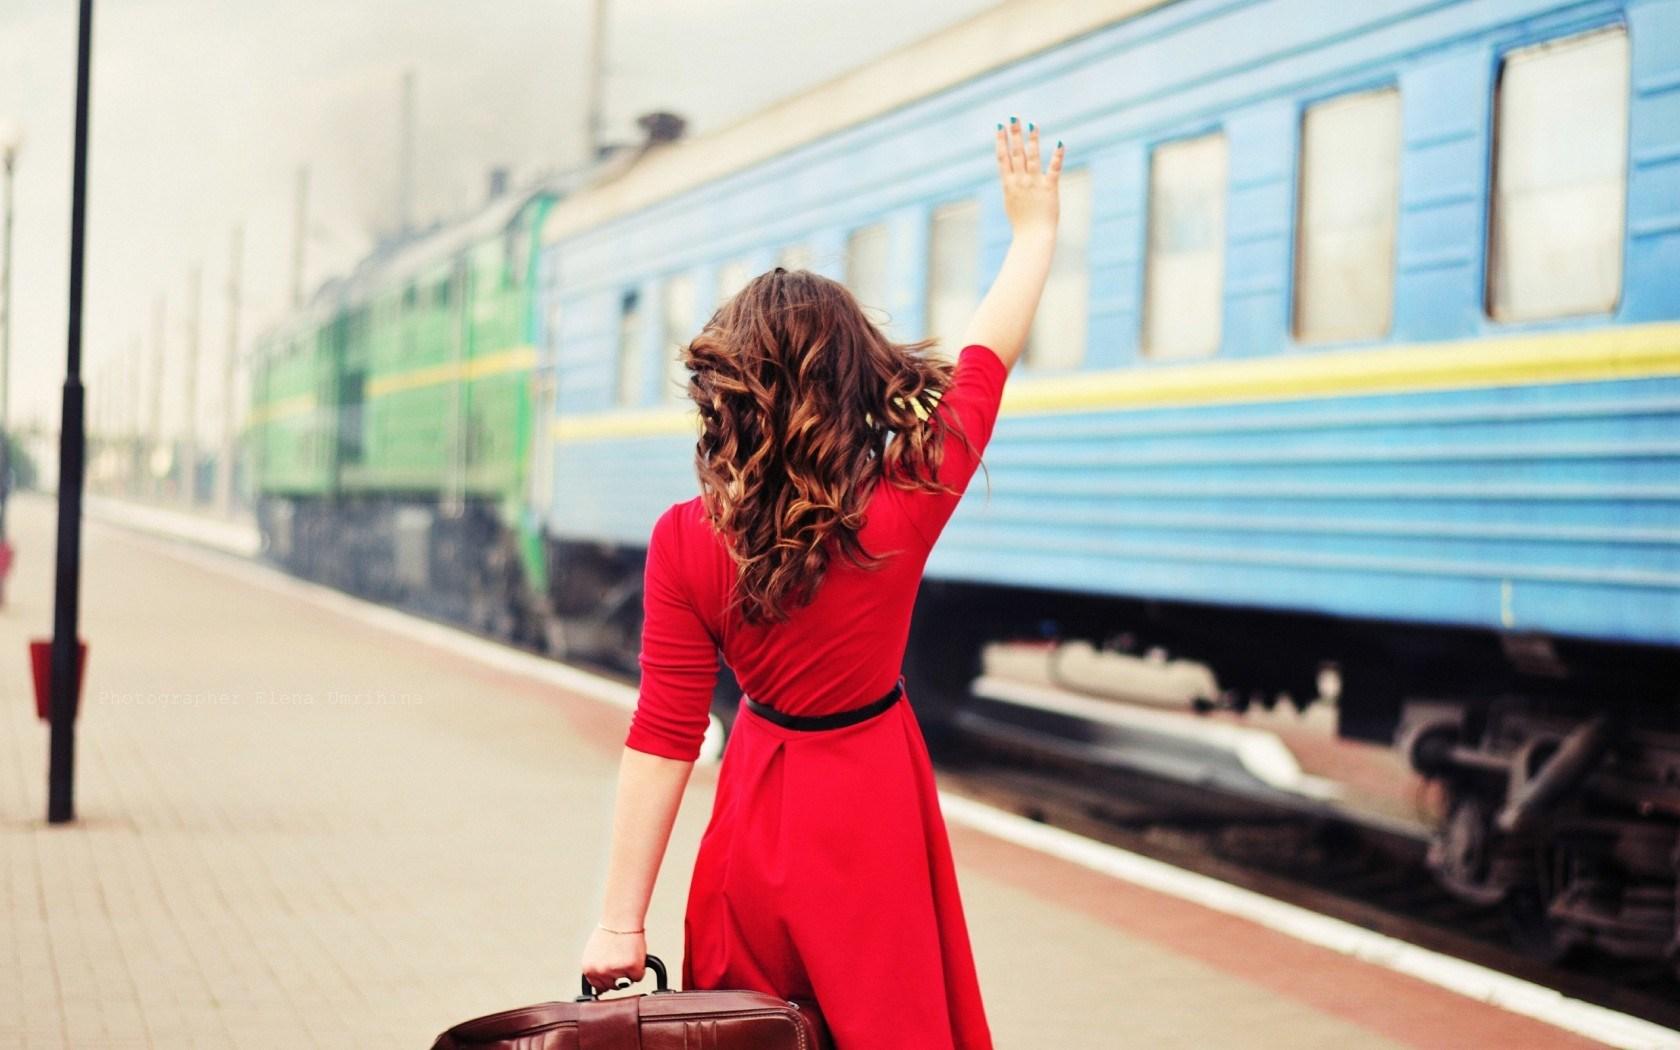 girl-red-dress-train-mood-hd-wallpaper